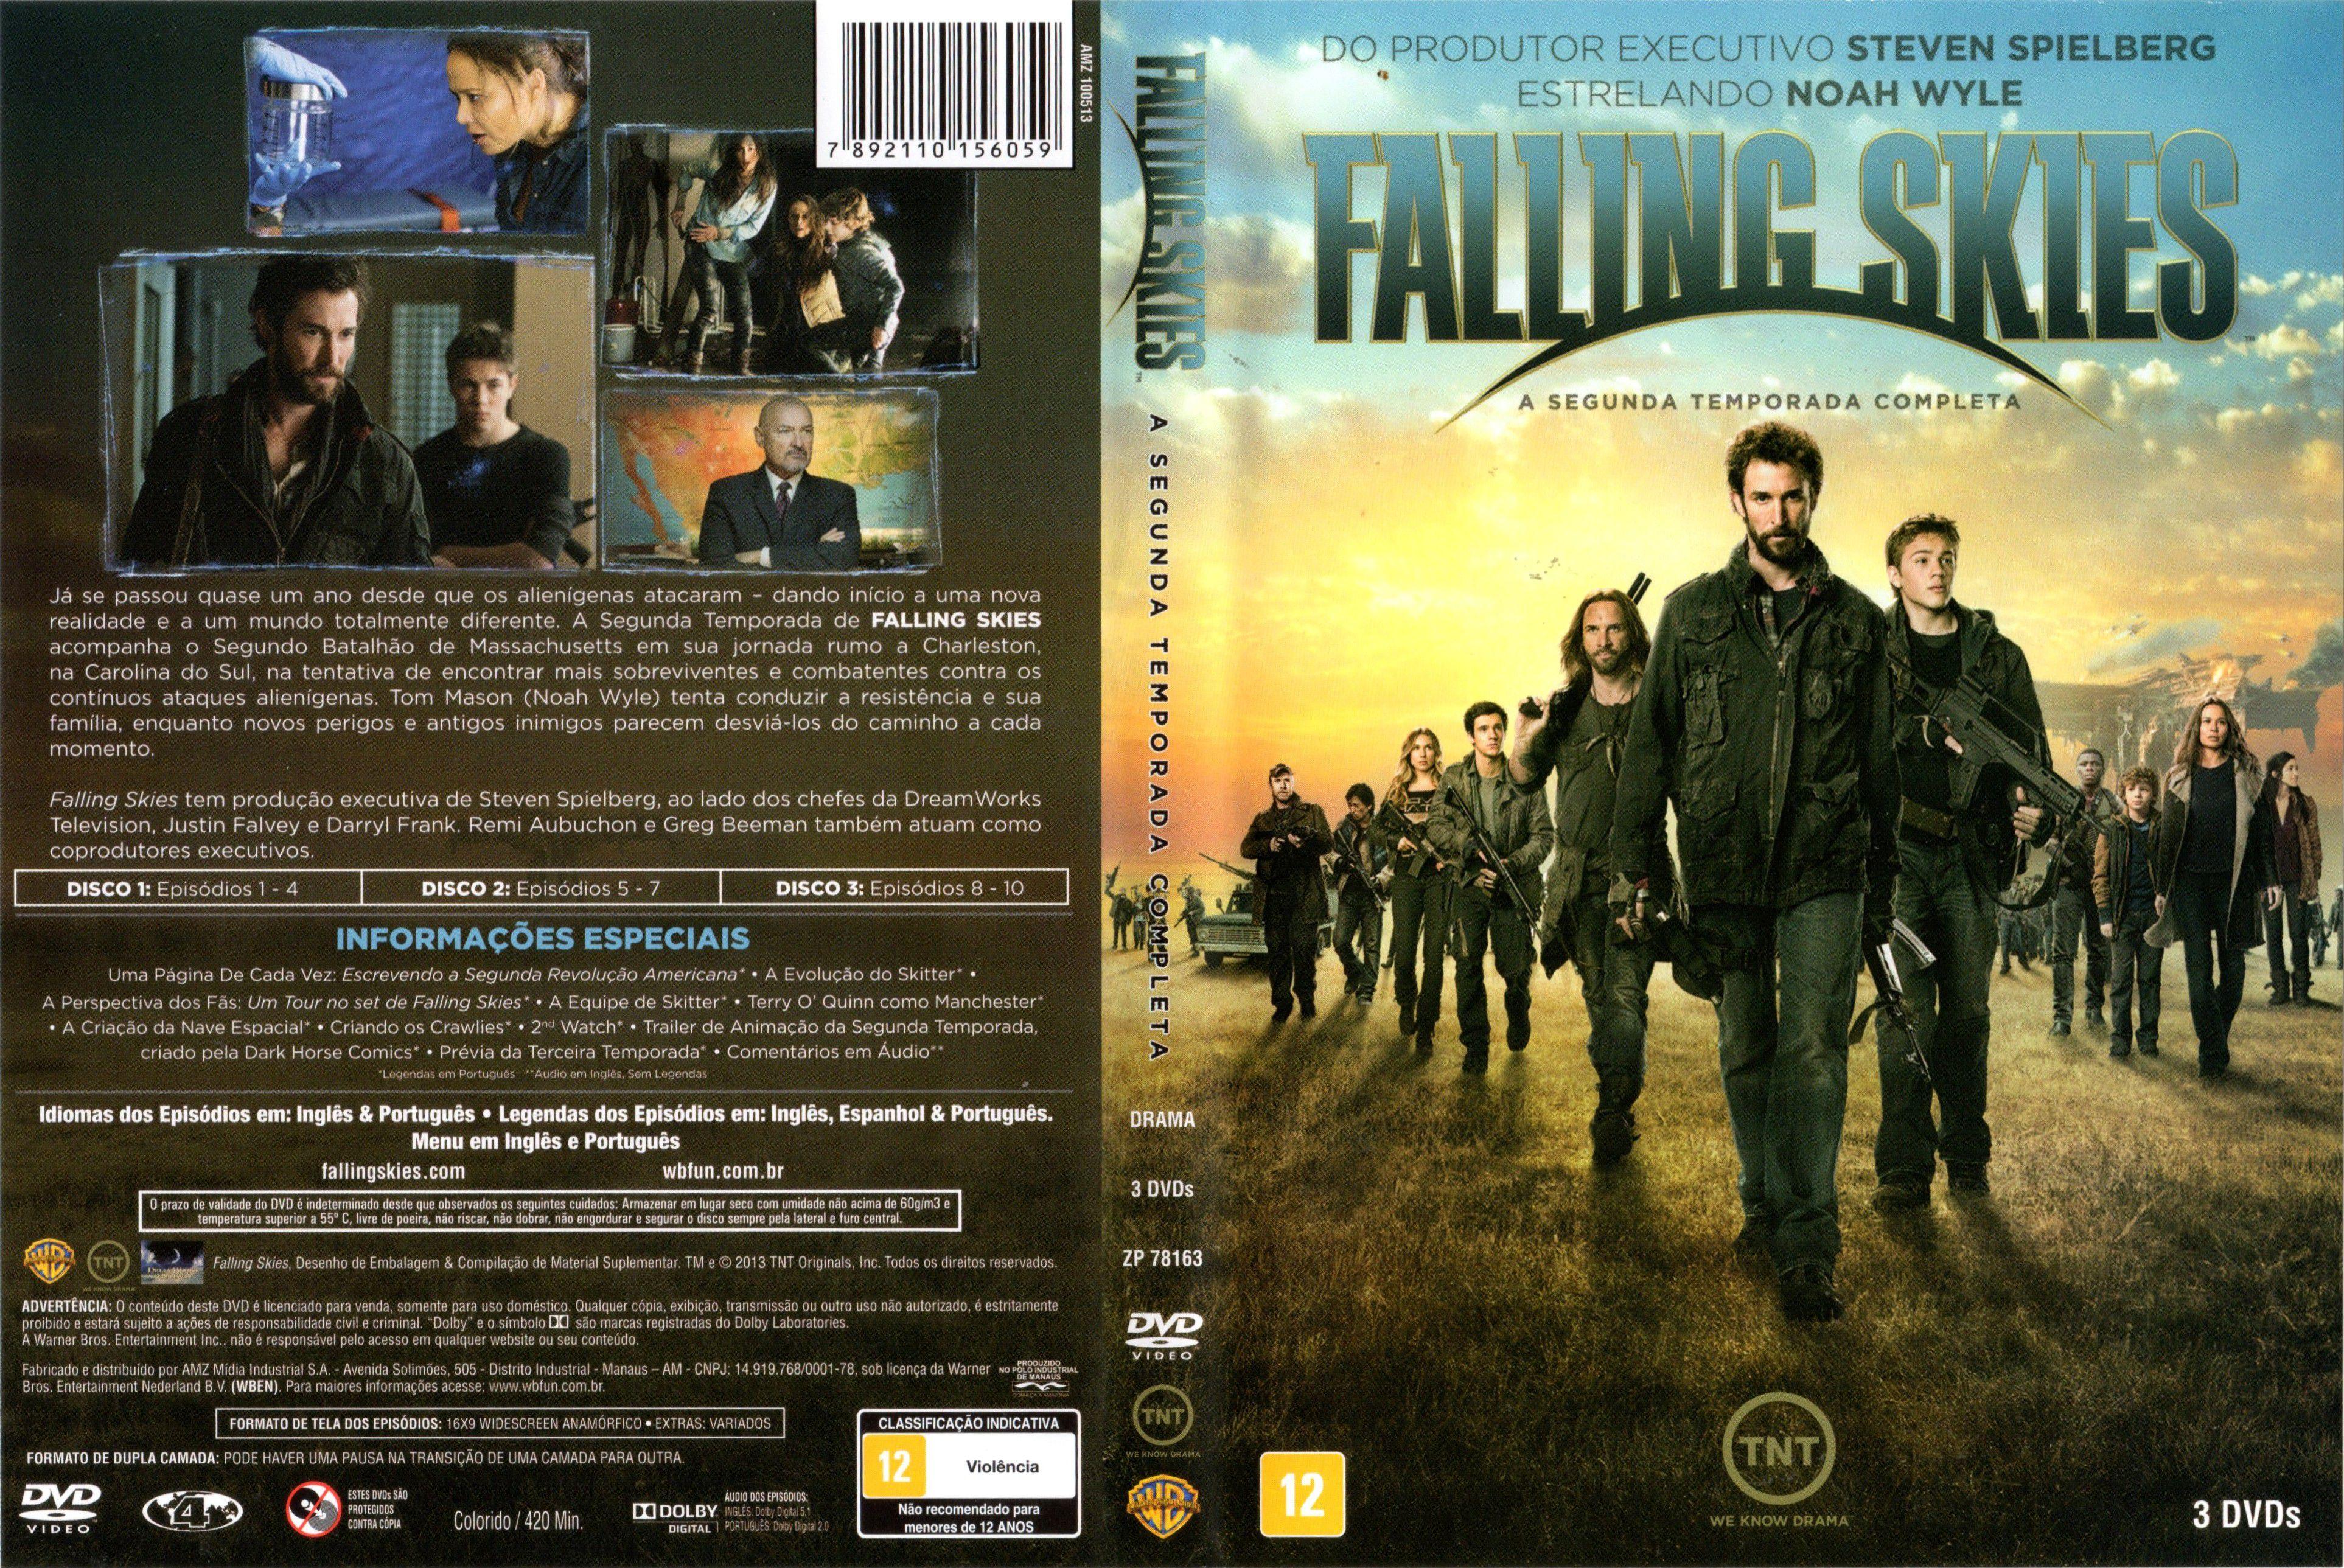 Capa DVD Falling Skies 2ª Temporada Completa - Gamecover   Capas ...